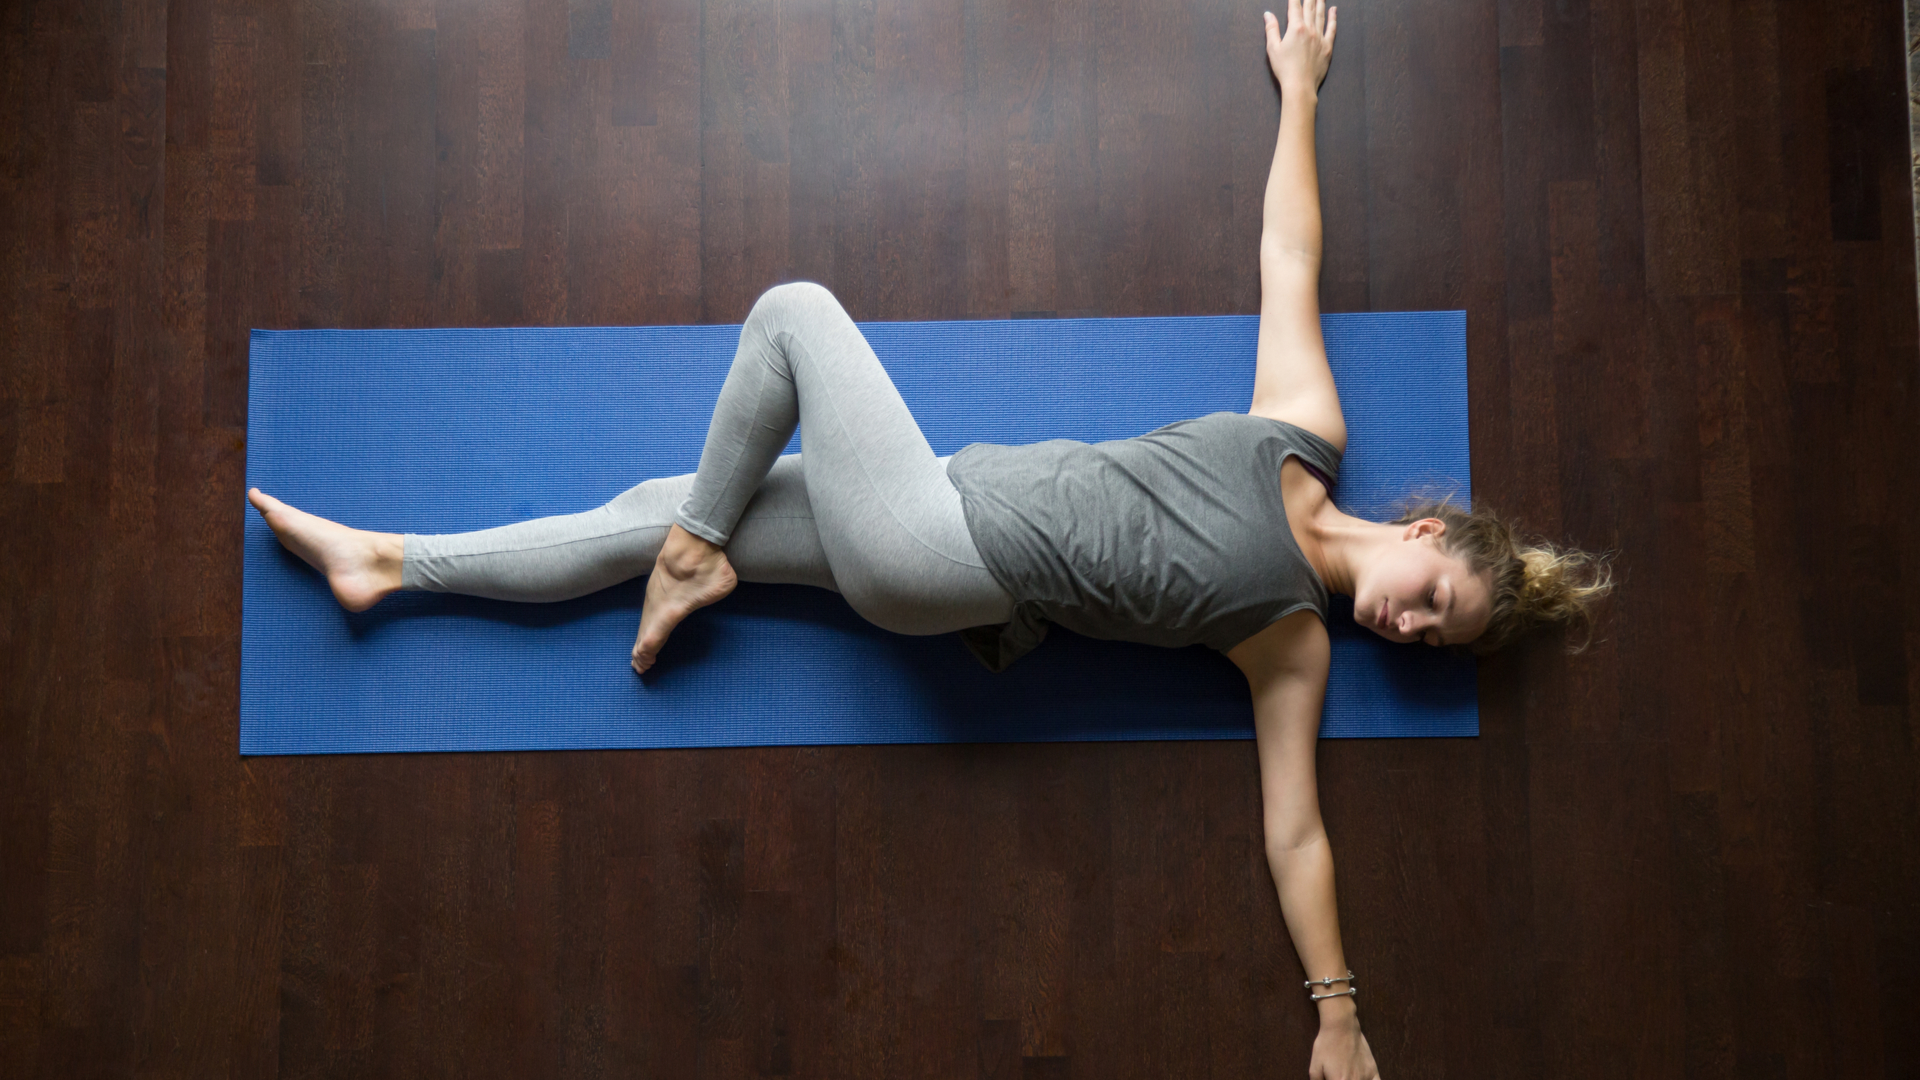 Liegende Drehung yoga